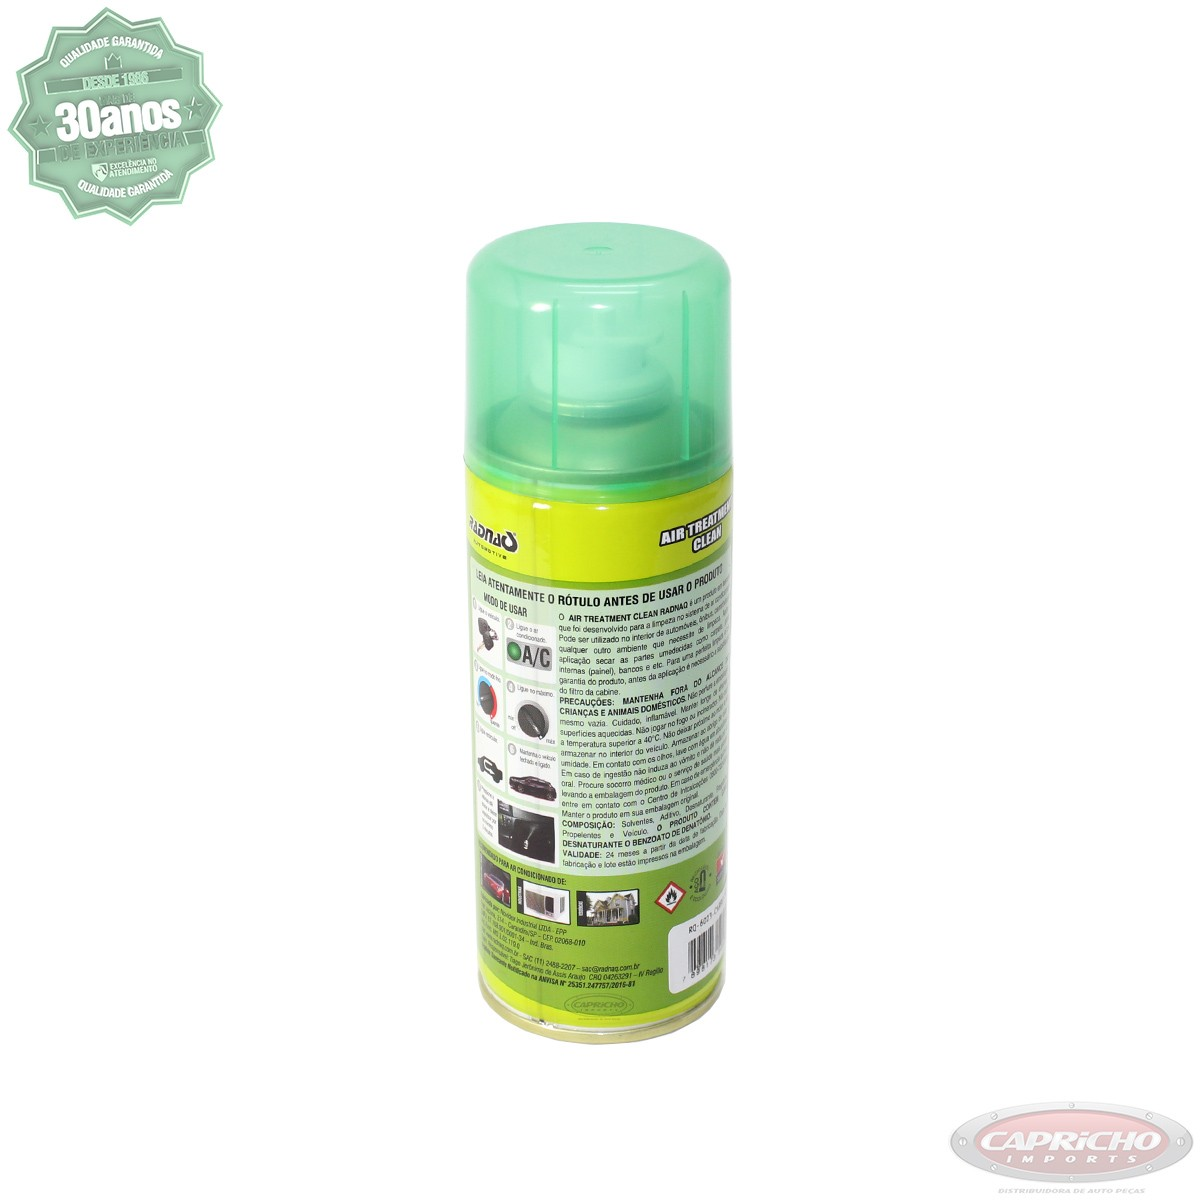 Limpa / Higieniza sistema ar condicionado - Radnaq - Inodoro